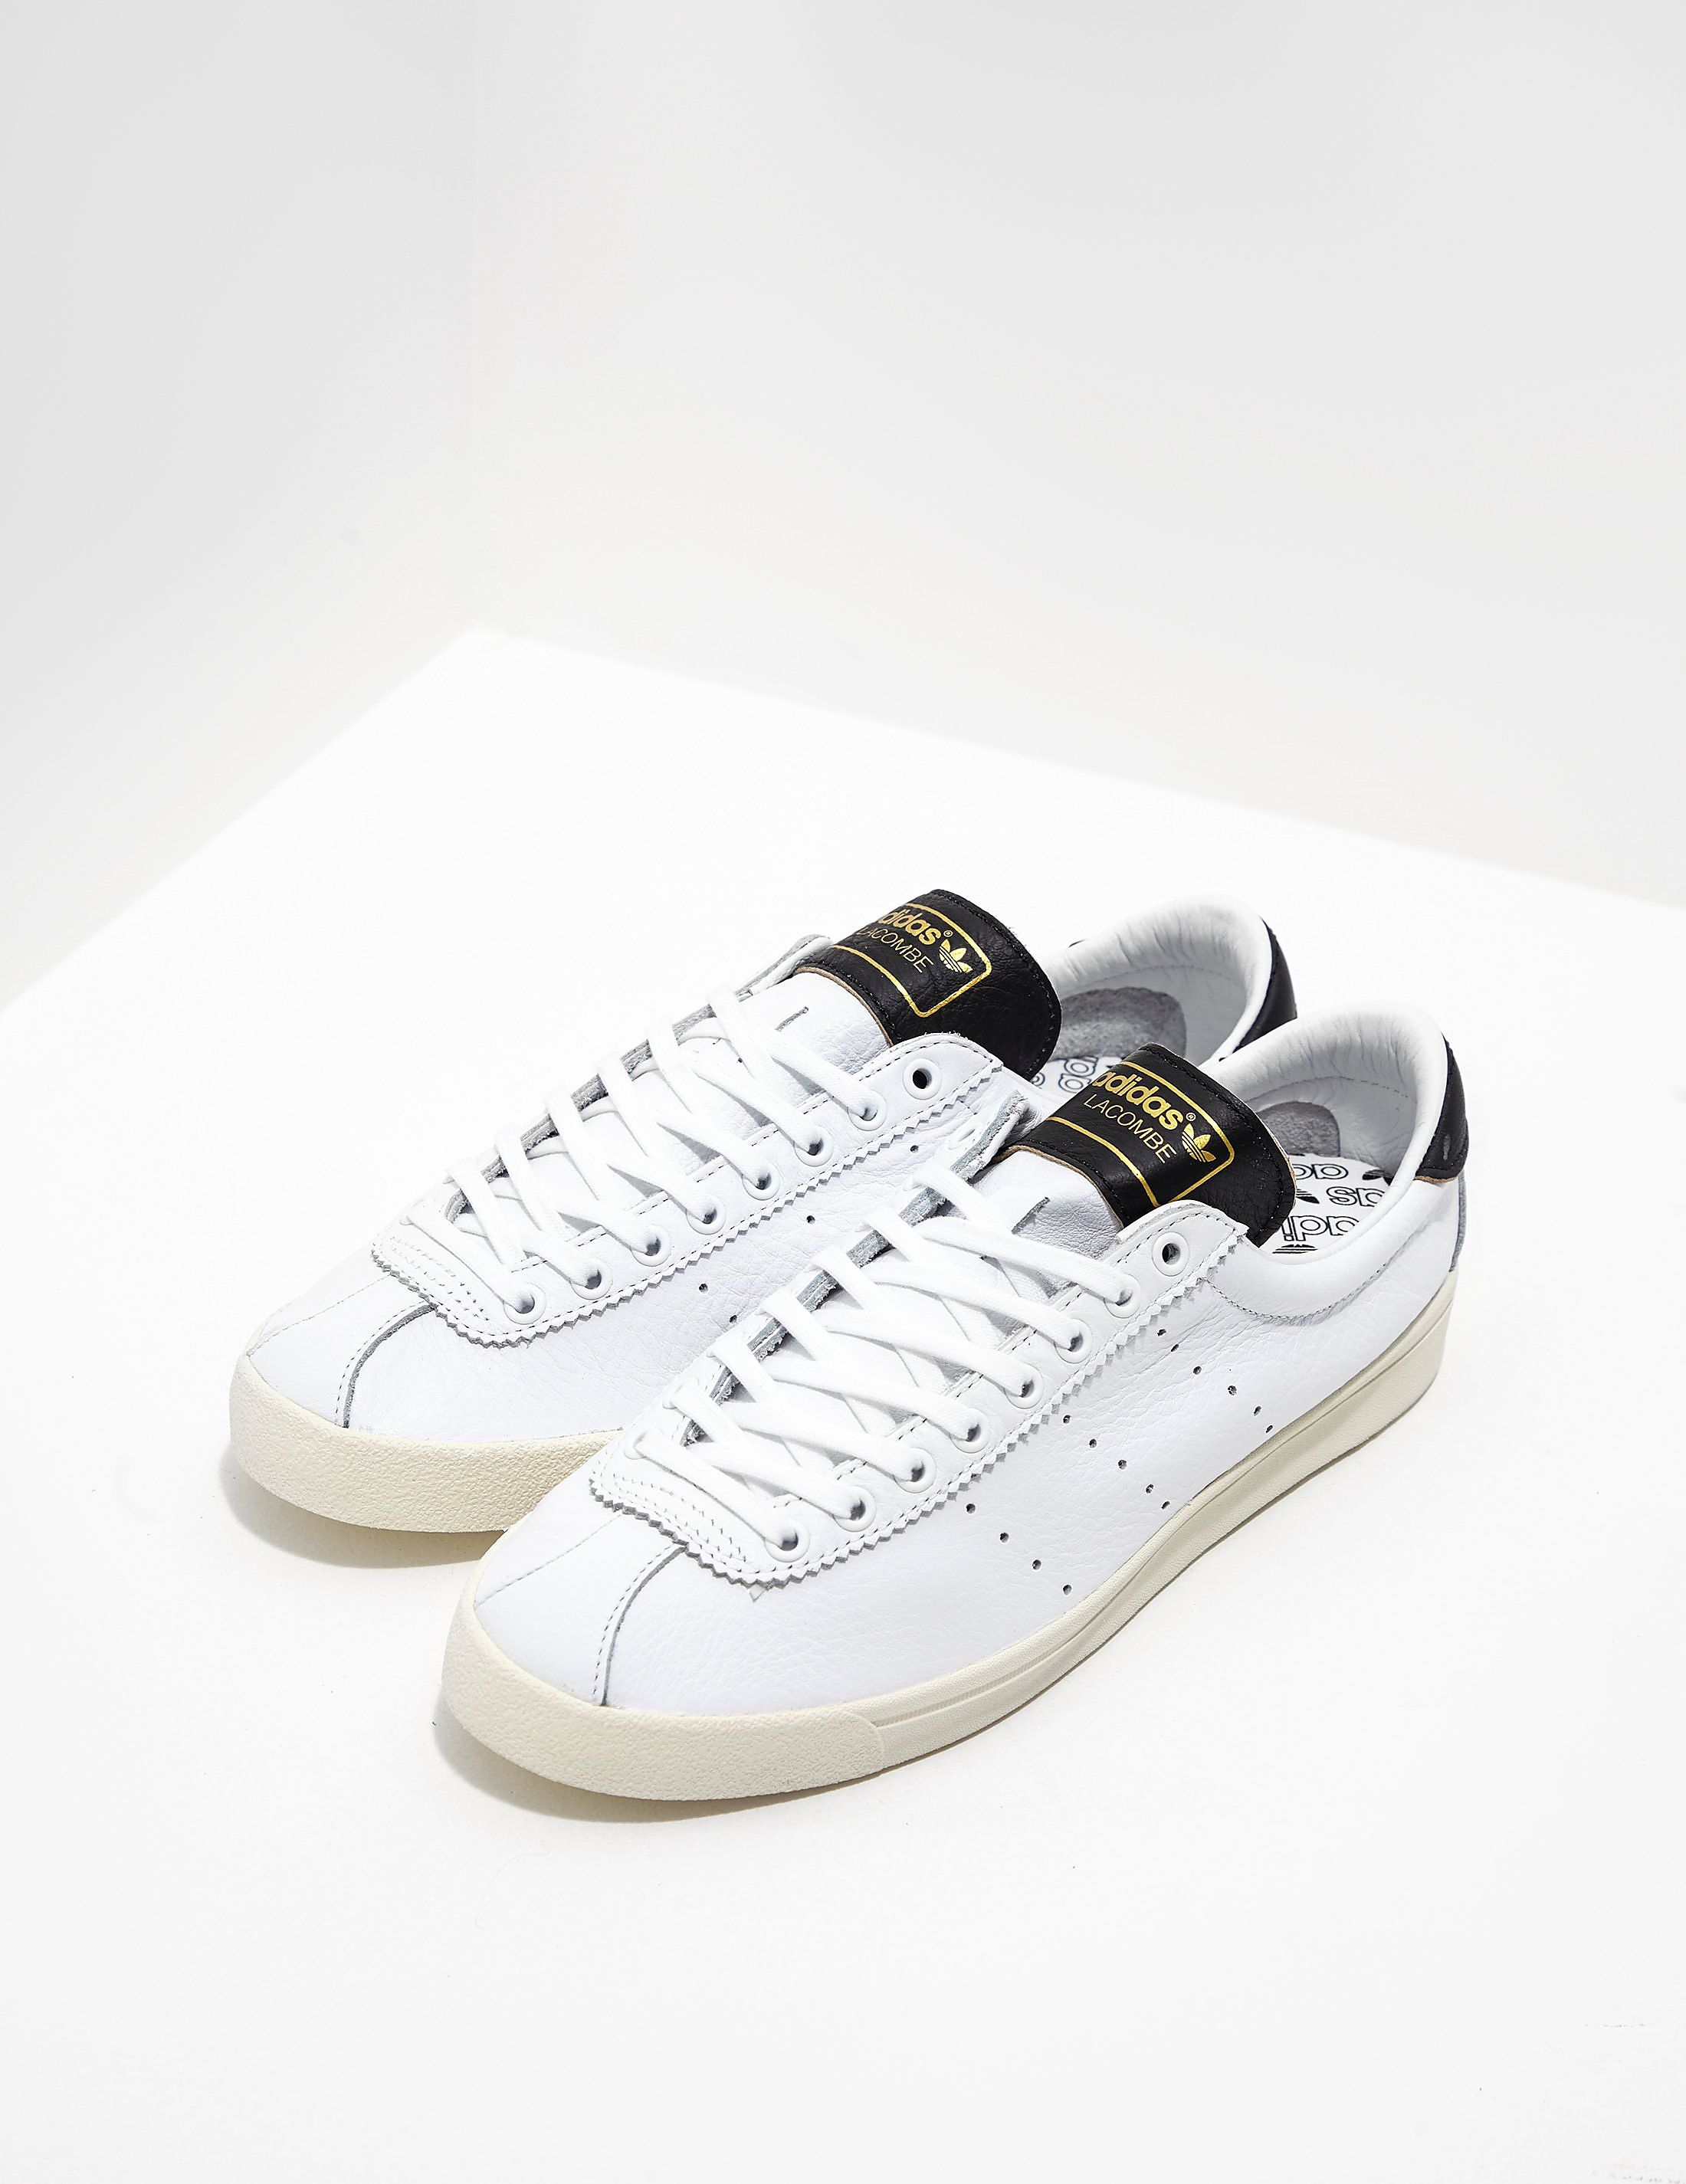 adidas Originals Lacombe | Size?